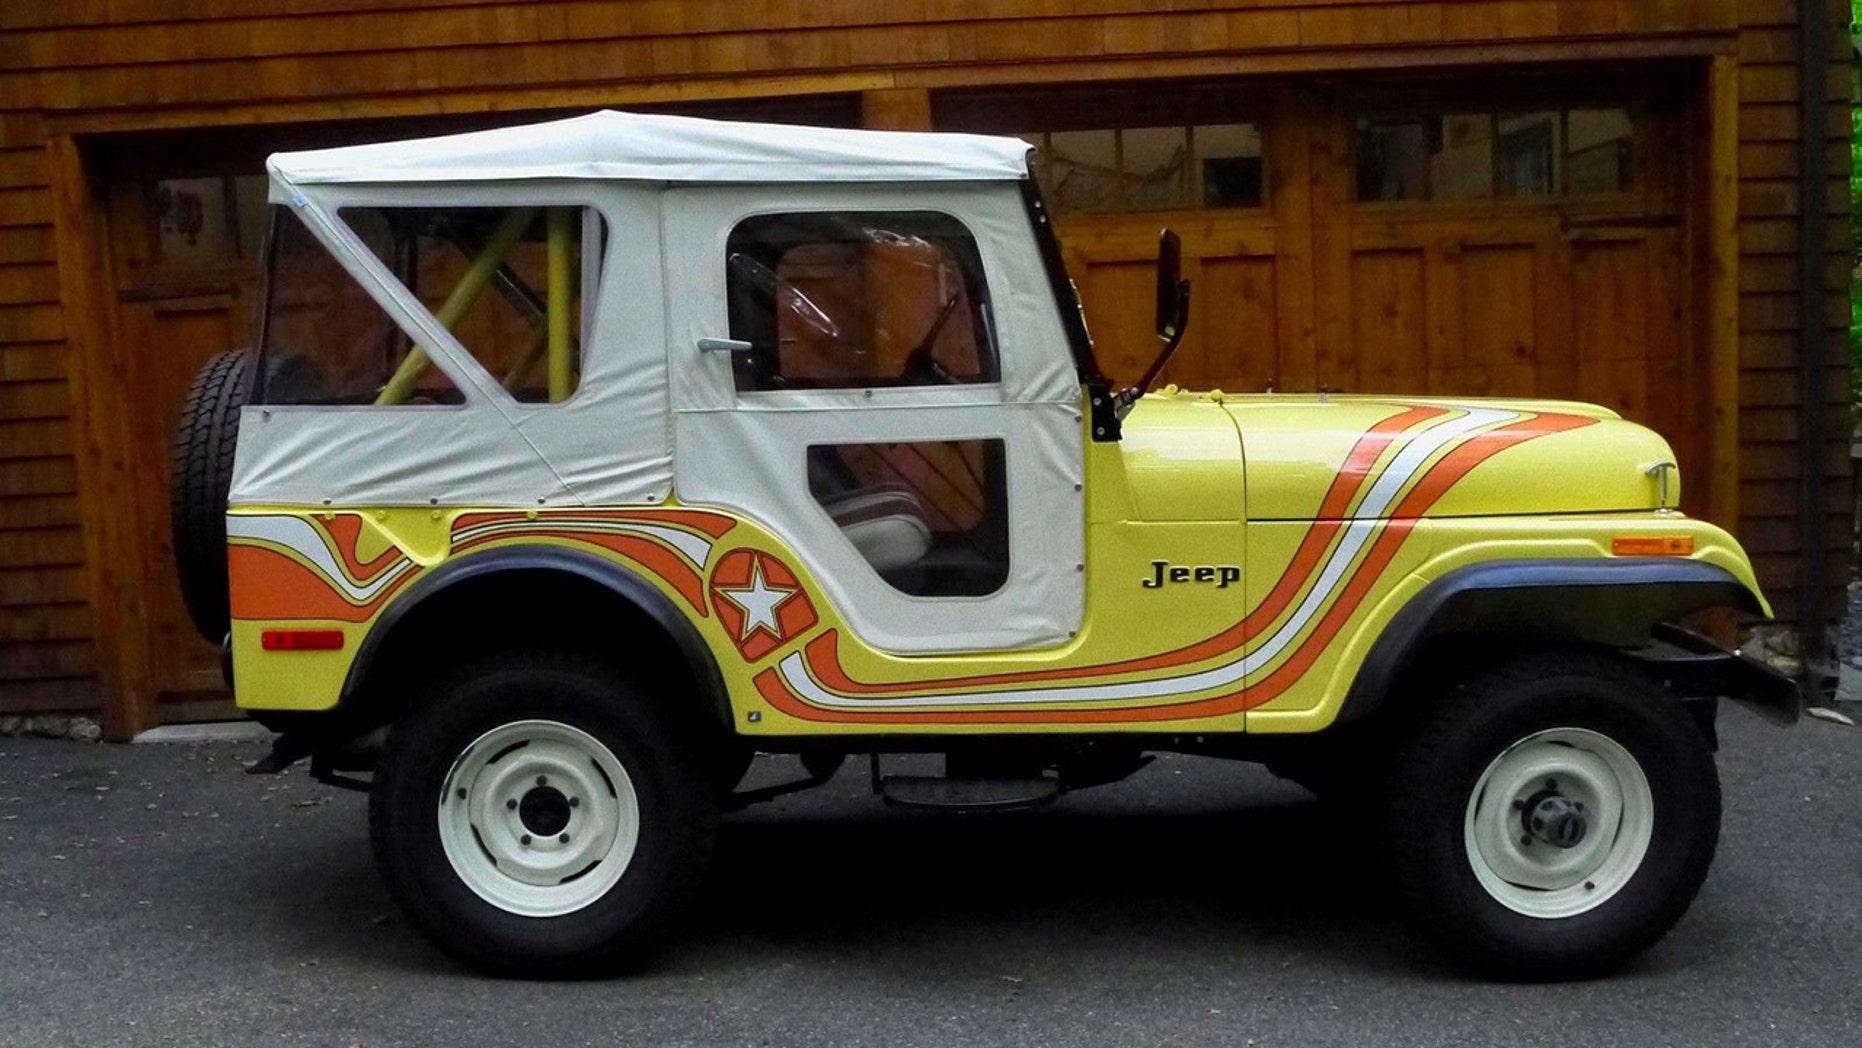 1973 CJ-5 Super Jeep side view